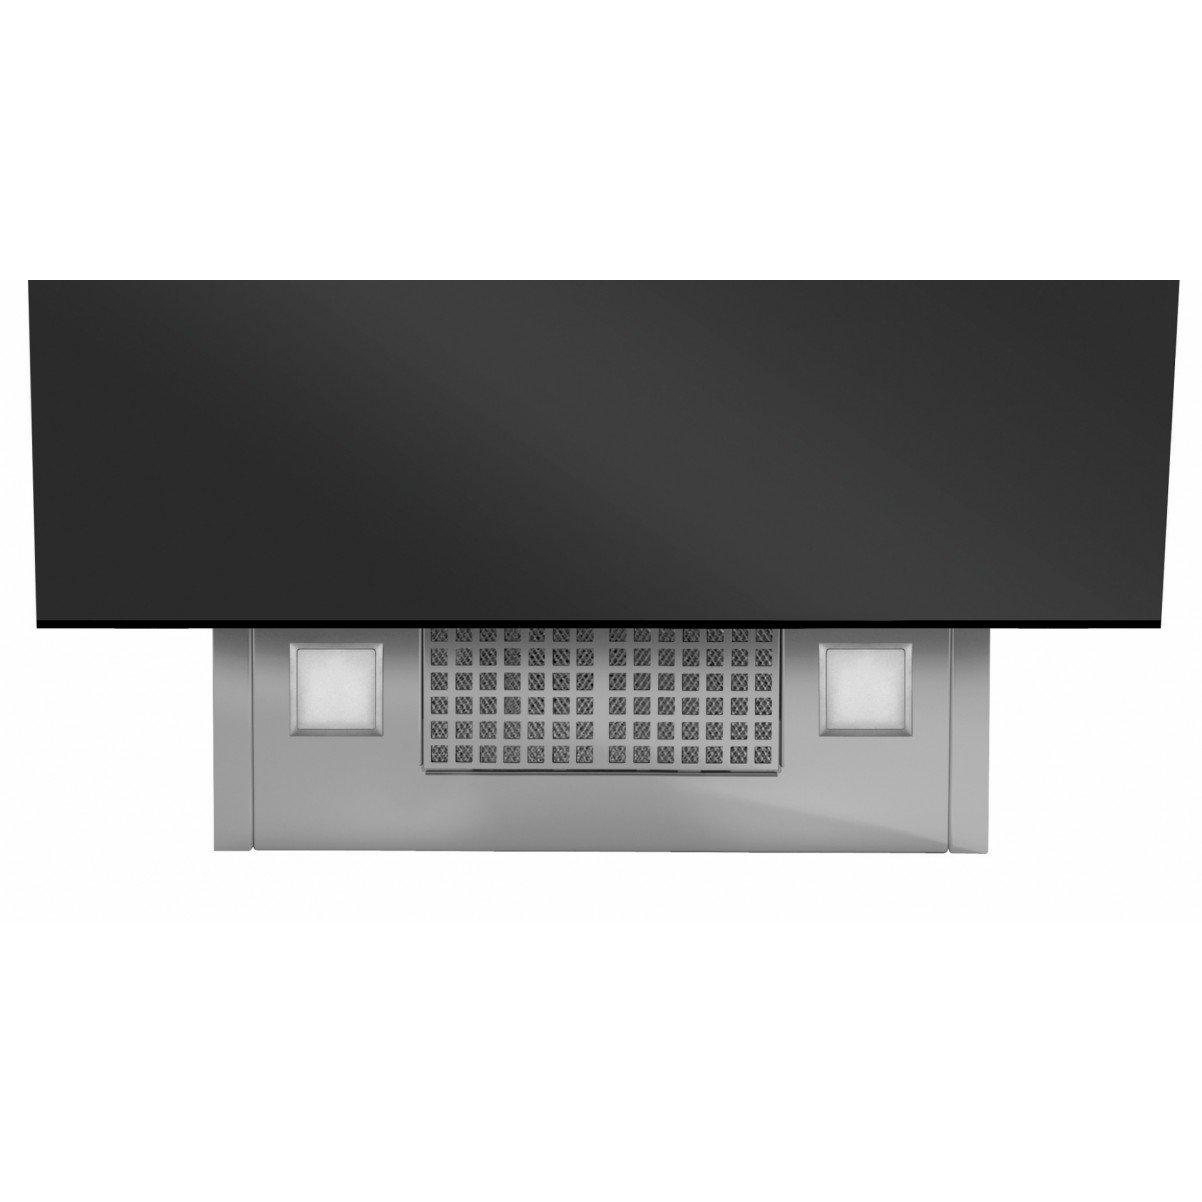 Premium line vertikal köksfläkt Vektor 90 cm vit/svart glas